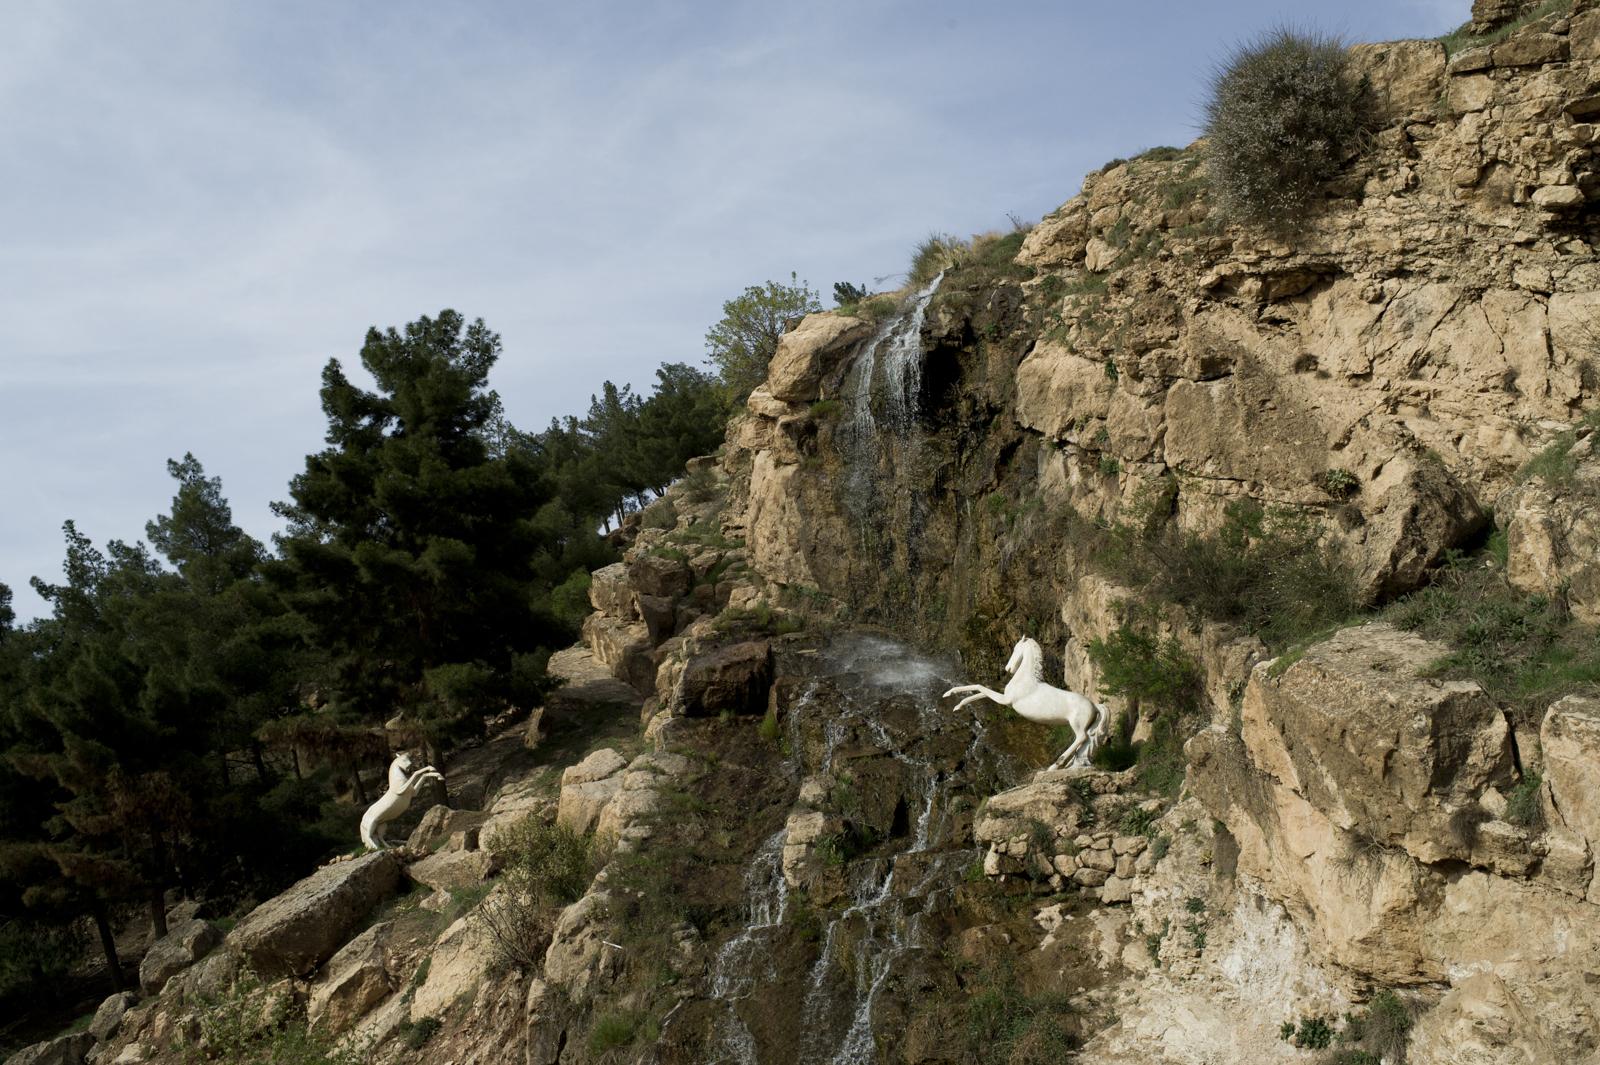 11_kurdistan_fabian-stamm_20120407.jpg